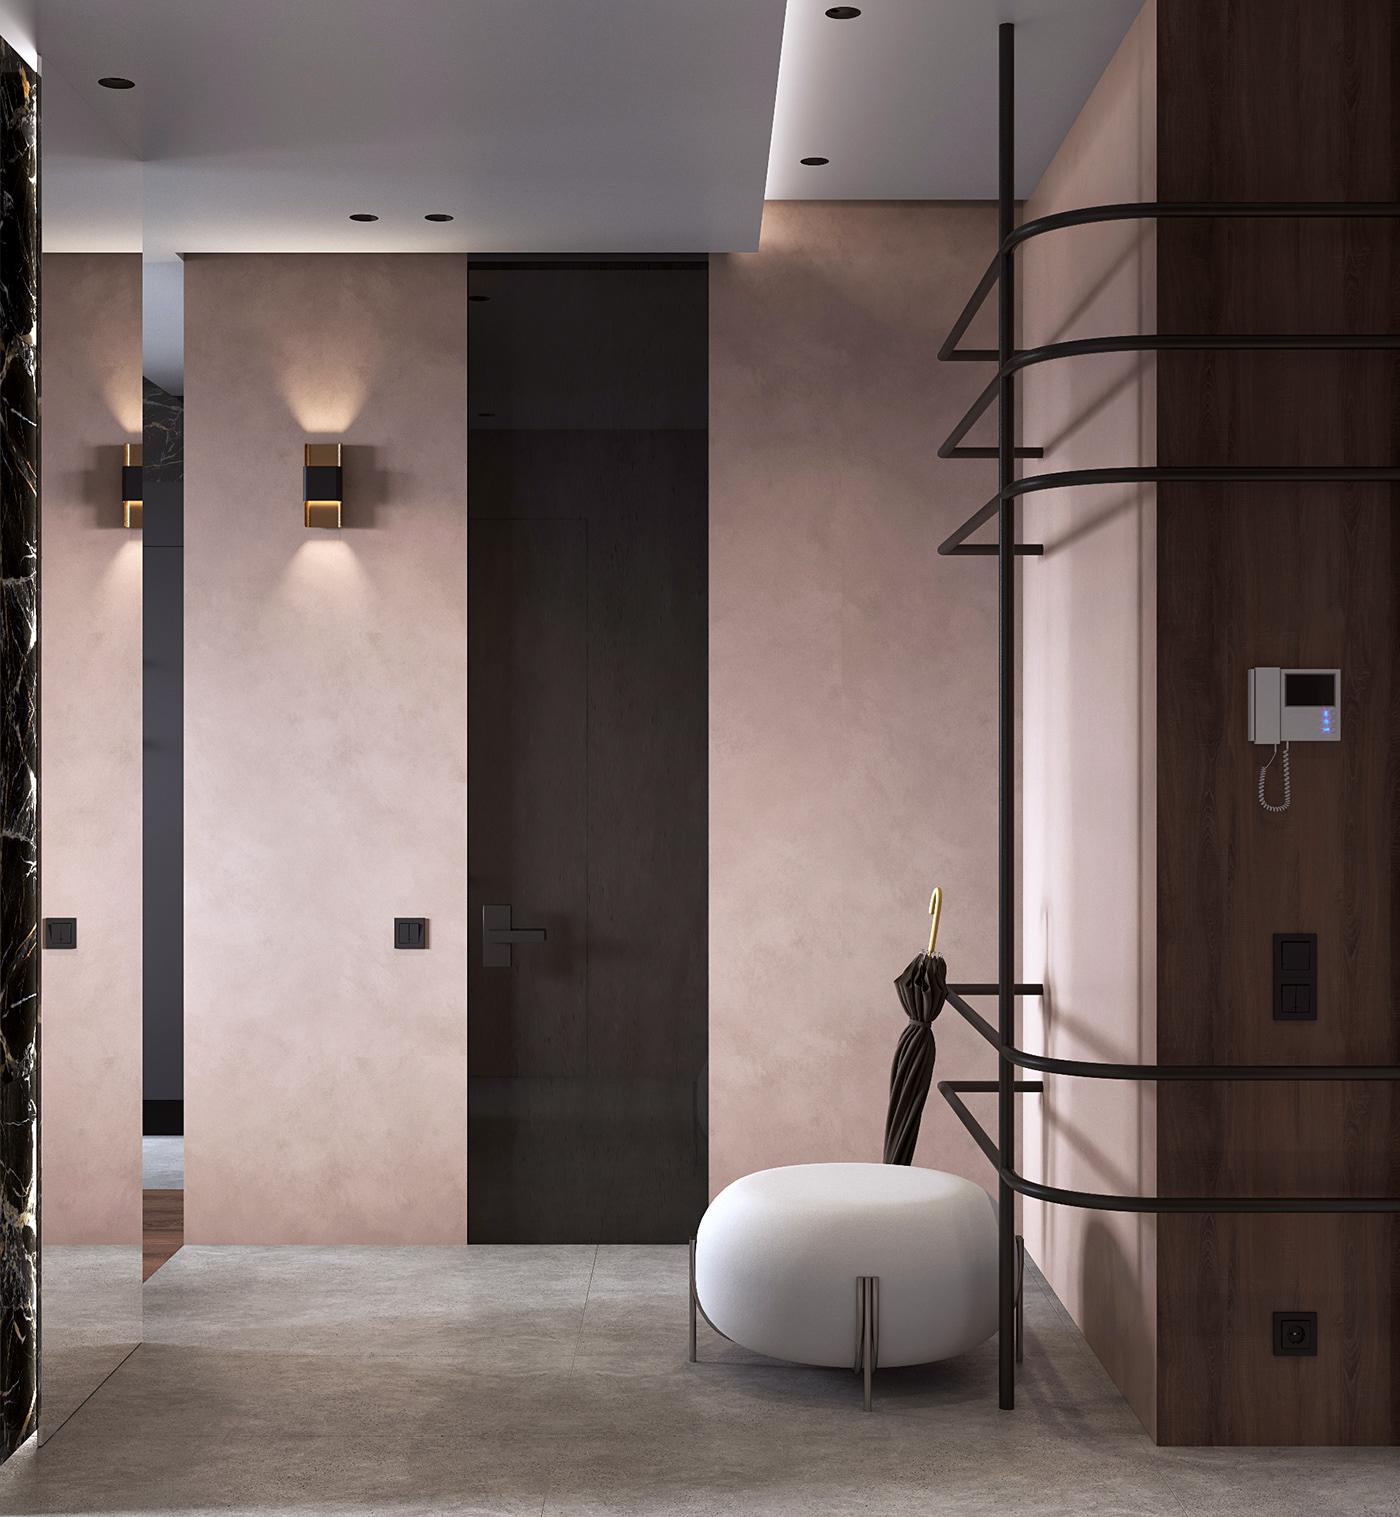 corona Render Interior modern CG visualization design